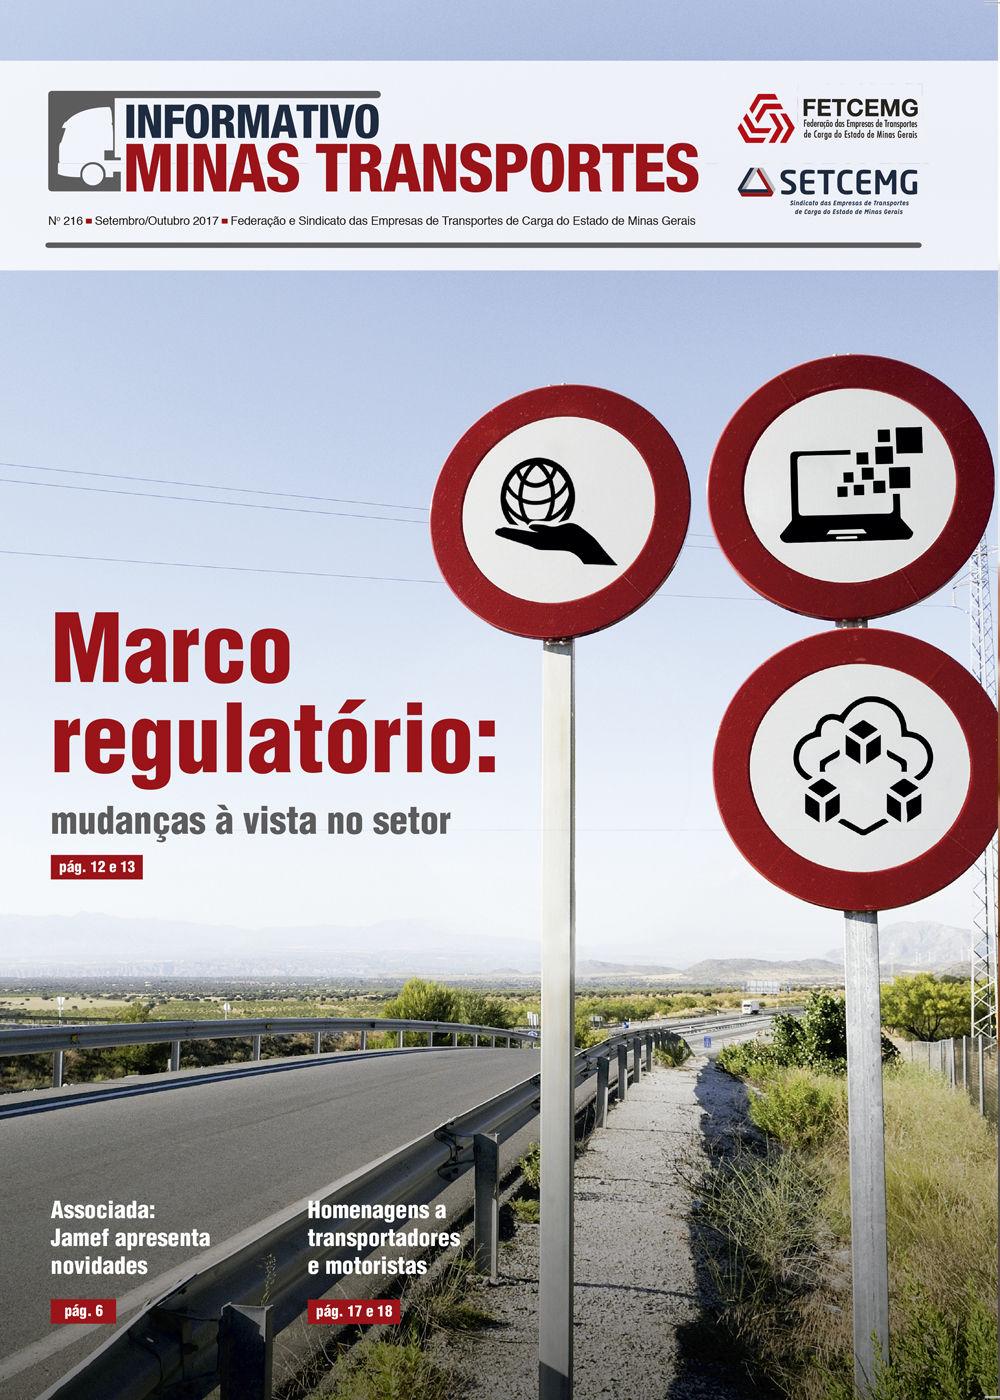 Informativo Minas Transportes - nº 216